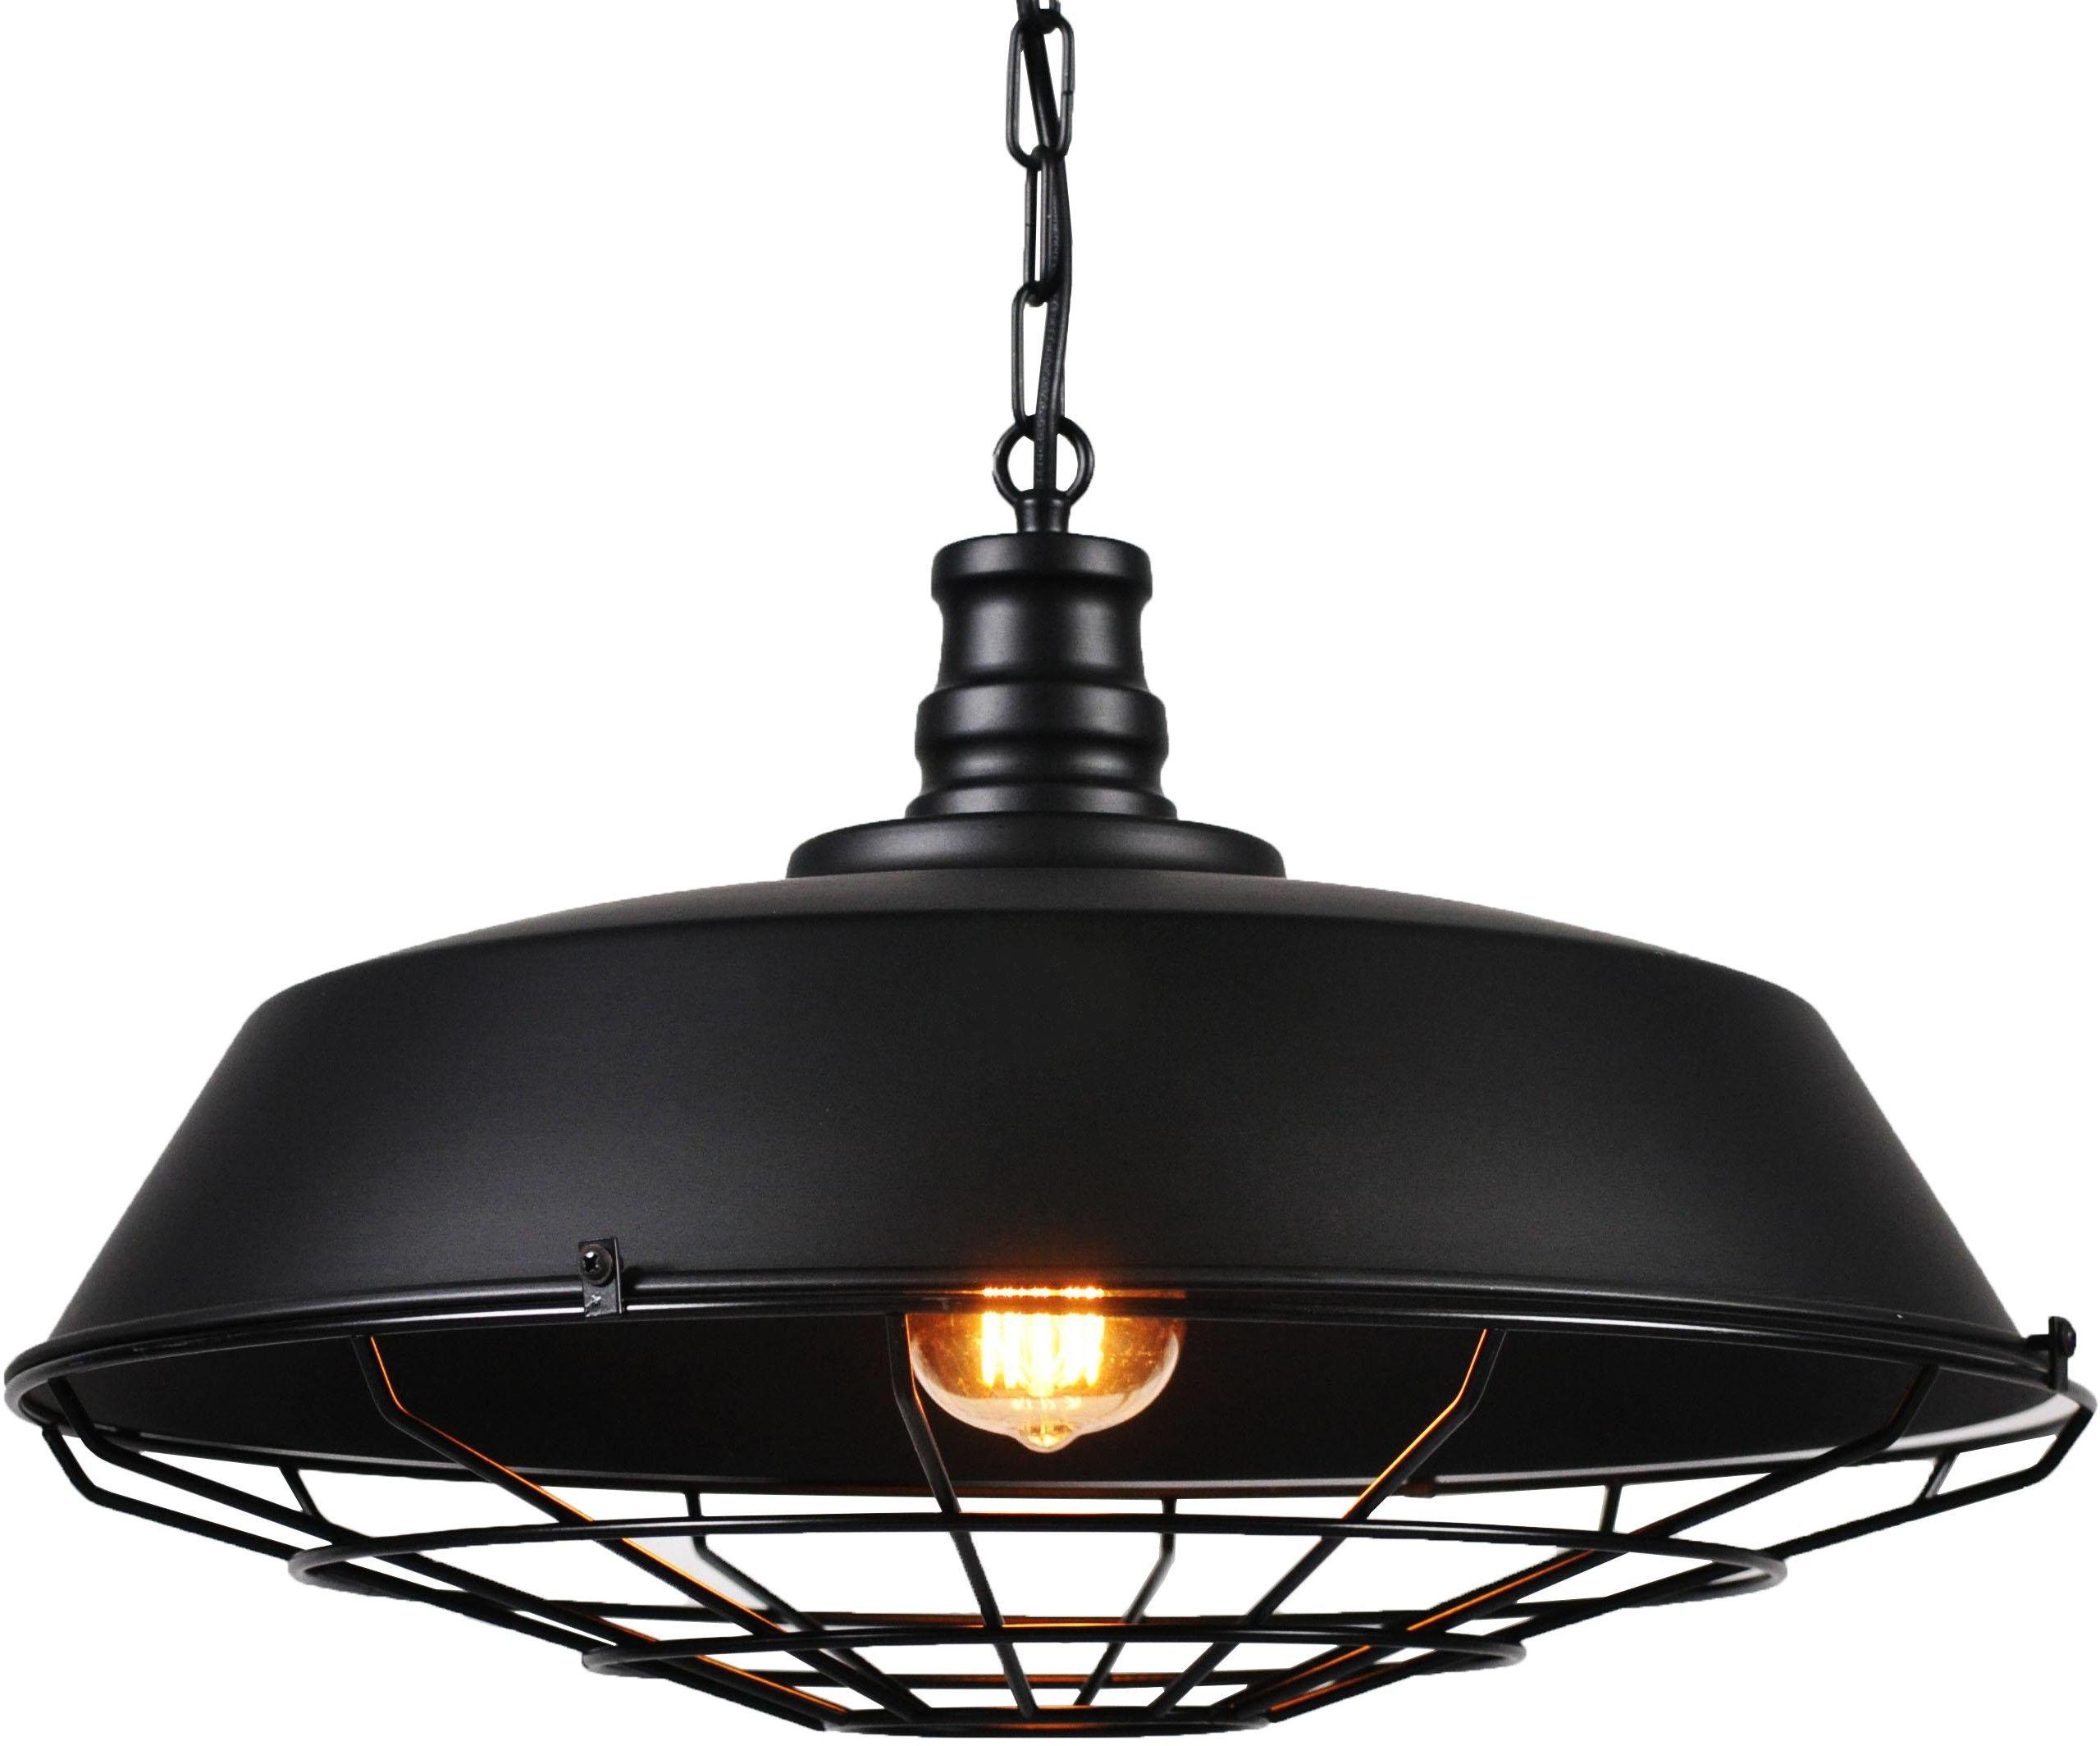 LAMPA WISZĄCA INDUSTRIALNA LOFT CZARNA ARIGIO D45